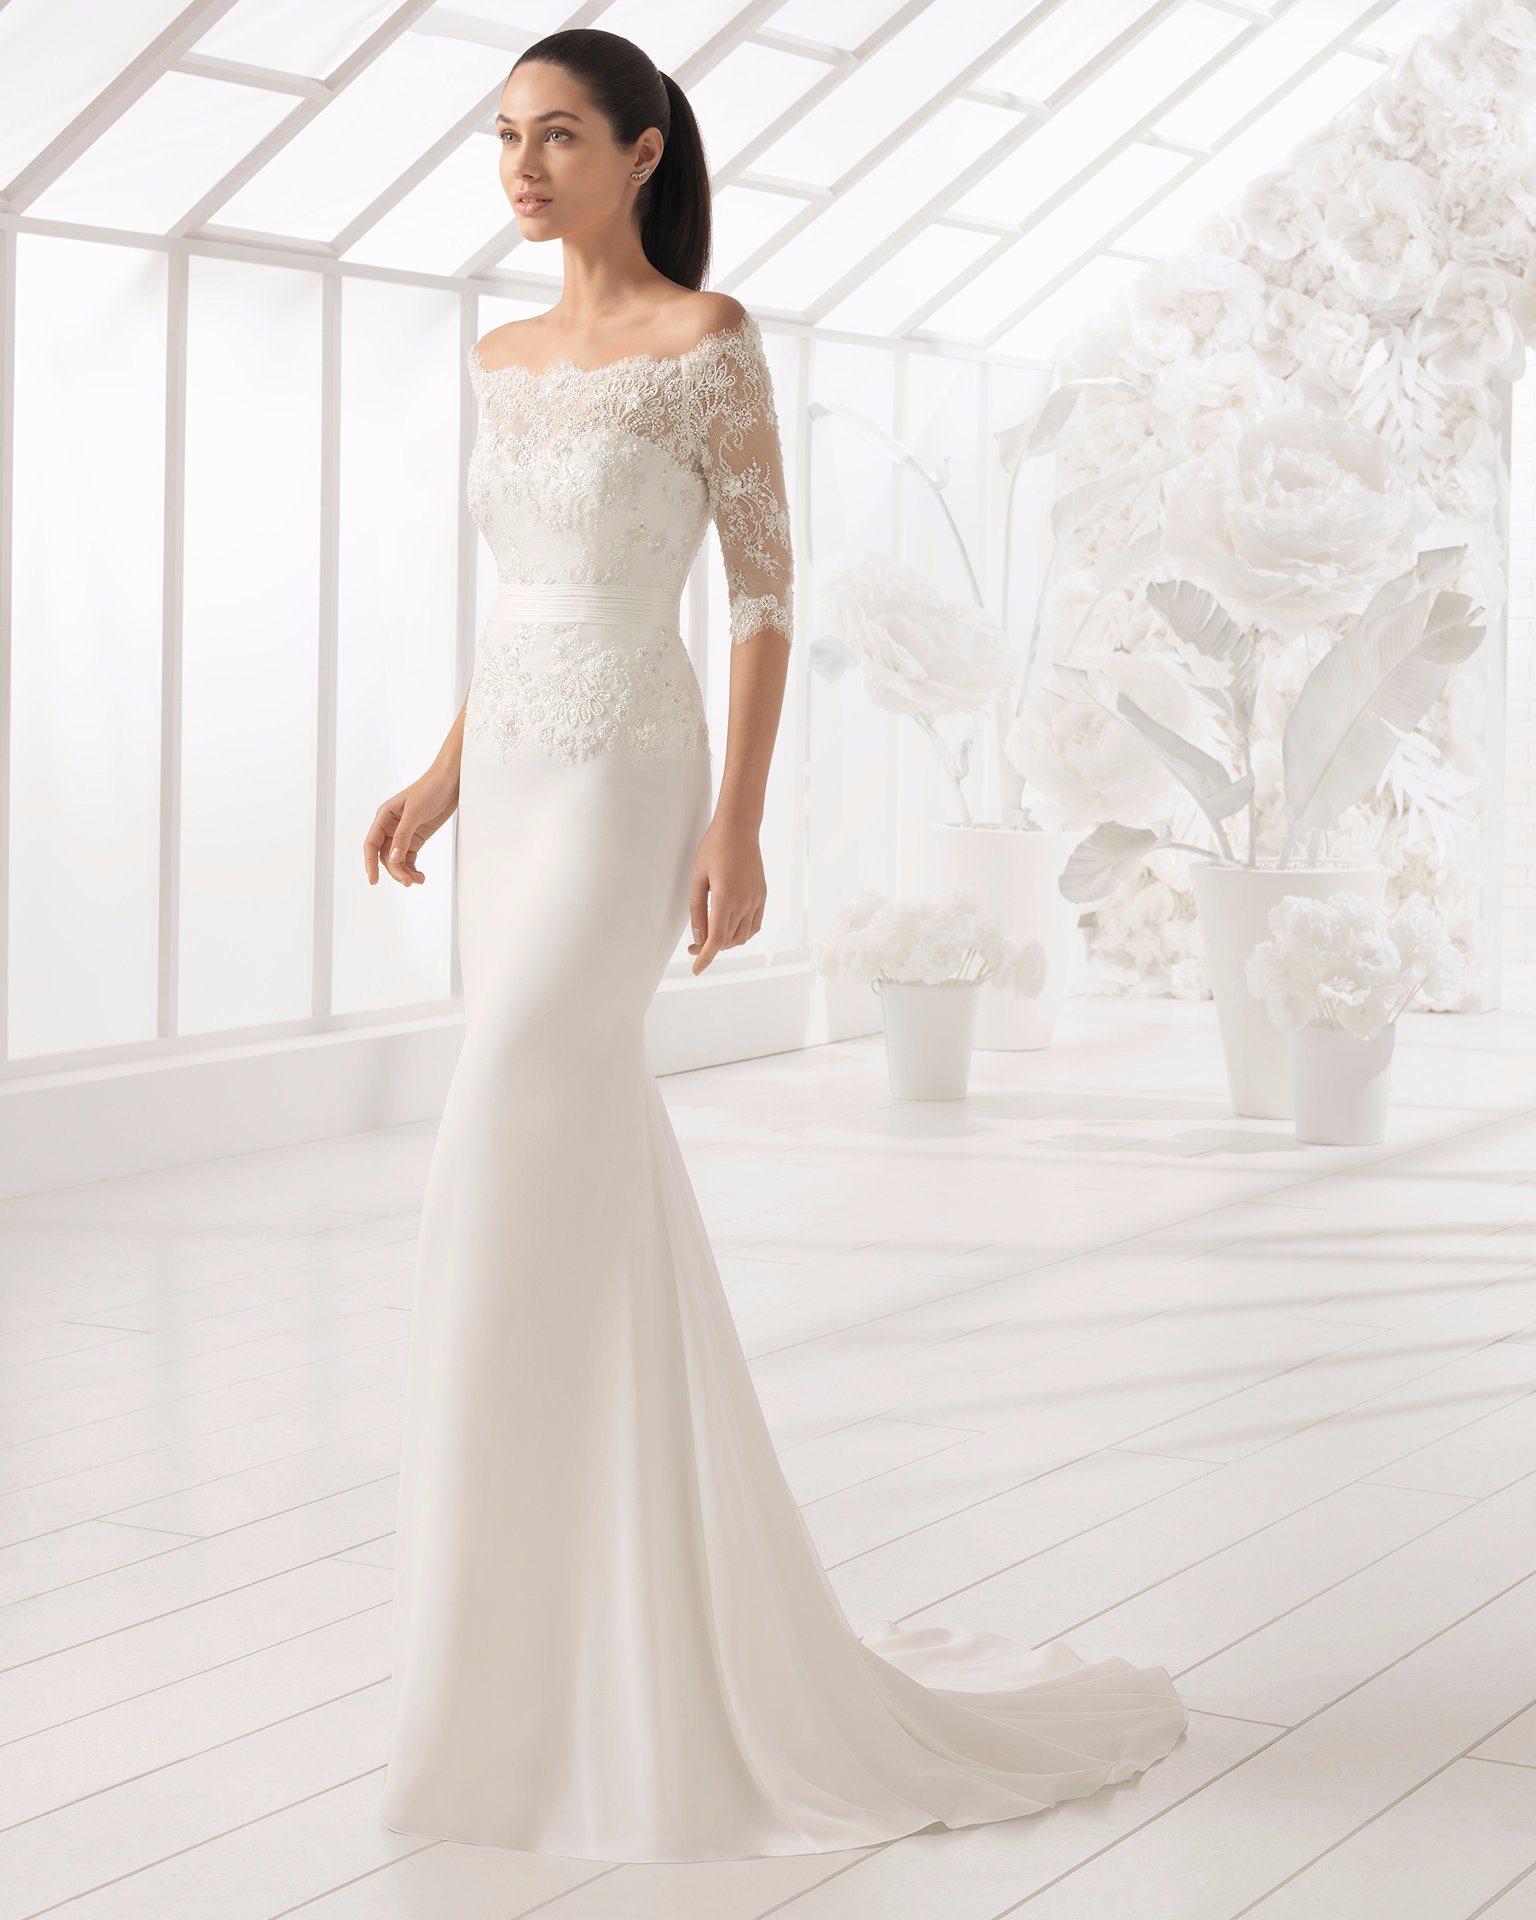 Shanghai Story Off Shoulder Wedding Gown for Bridal Half Sleeve Wedding Dress